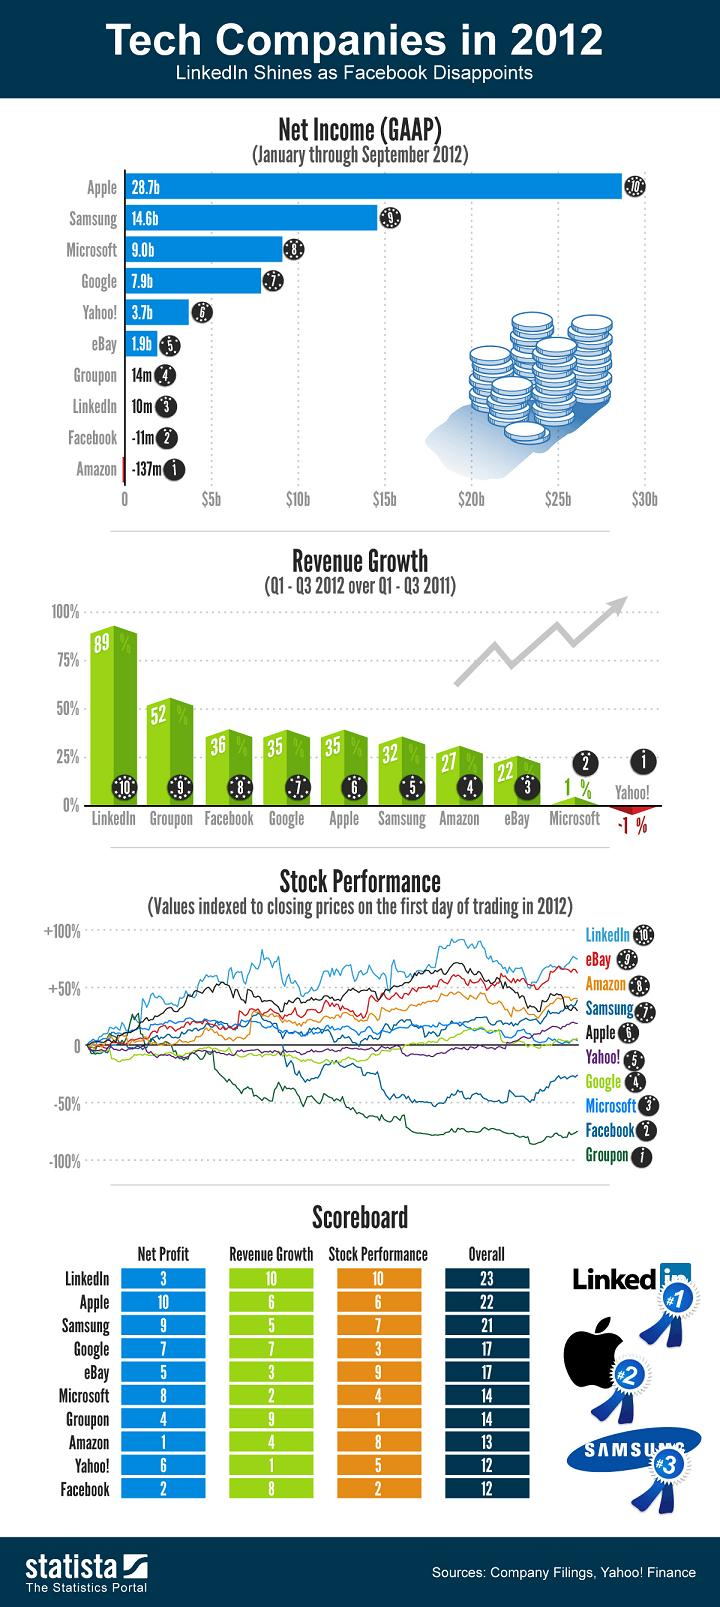 statista-tech-companies-2012-0